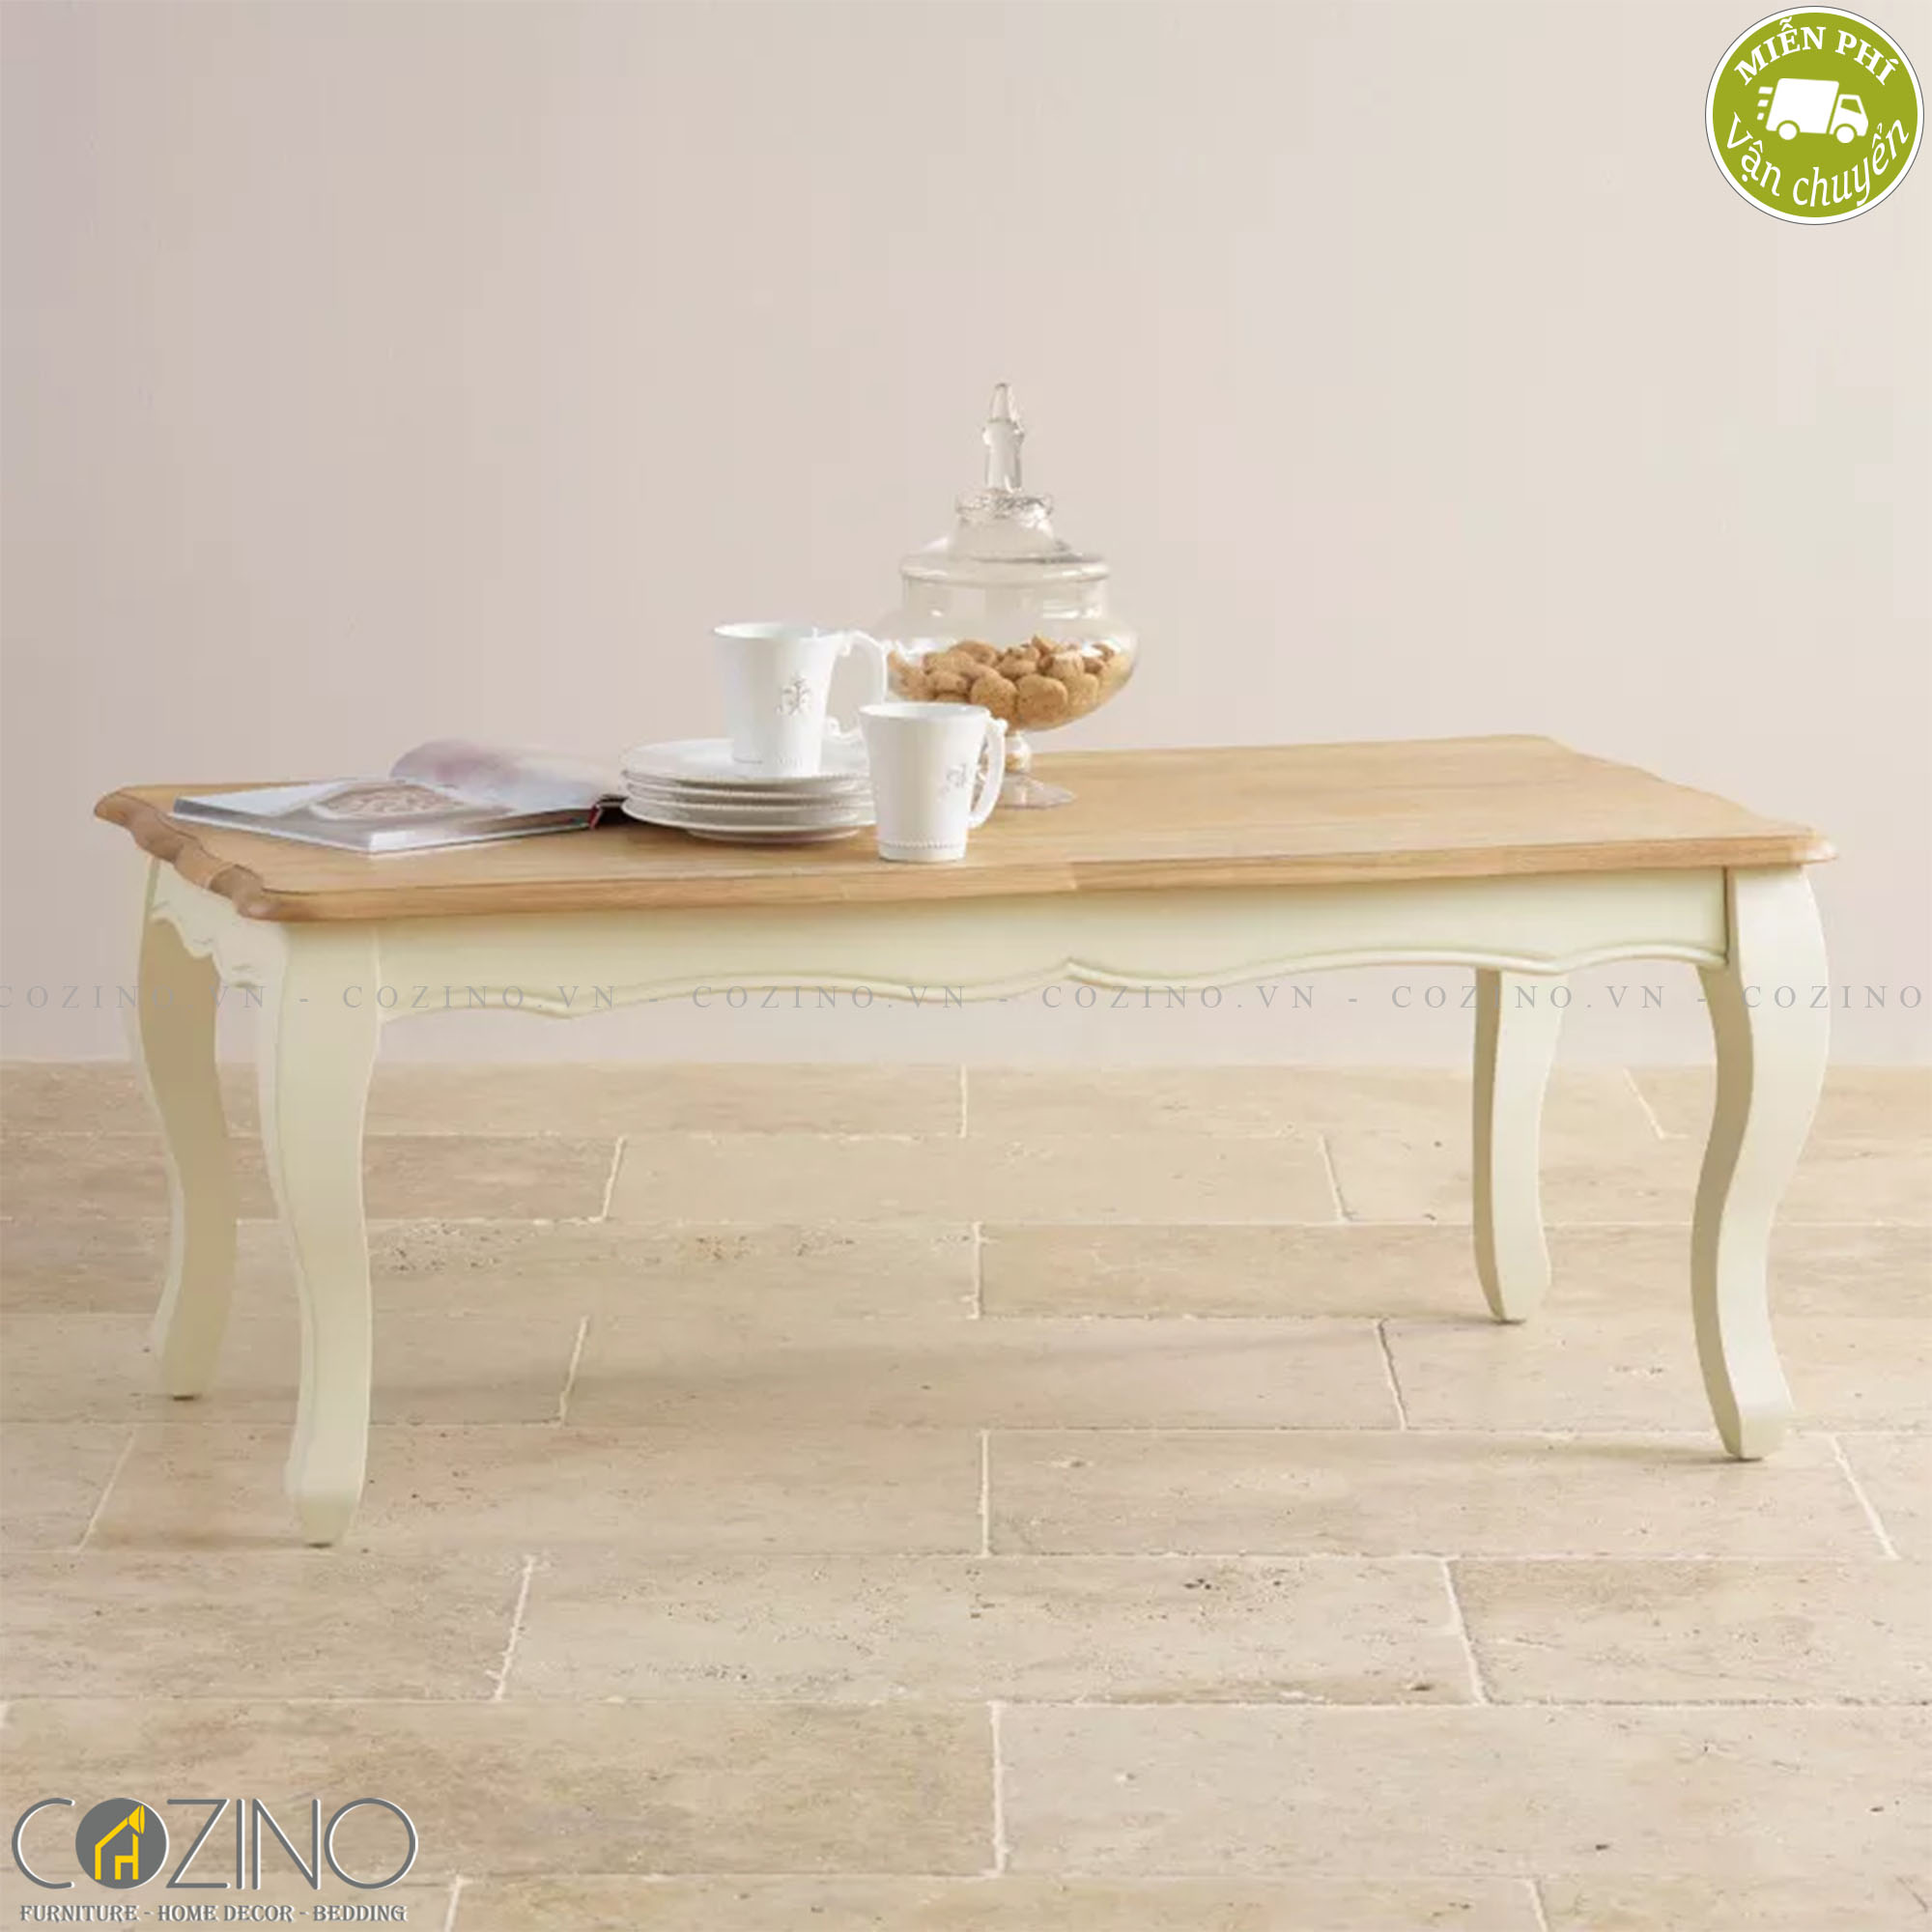 Bàn sofa Skye 100% gỗ sồi - Cozino